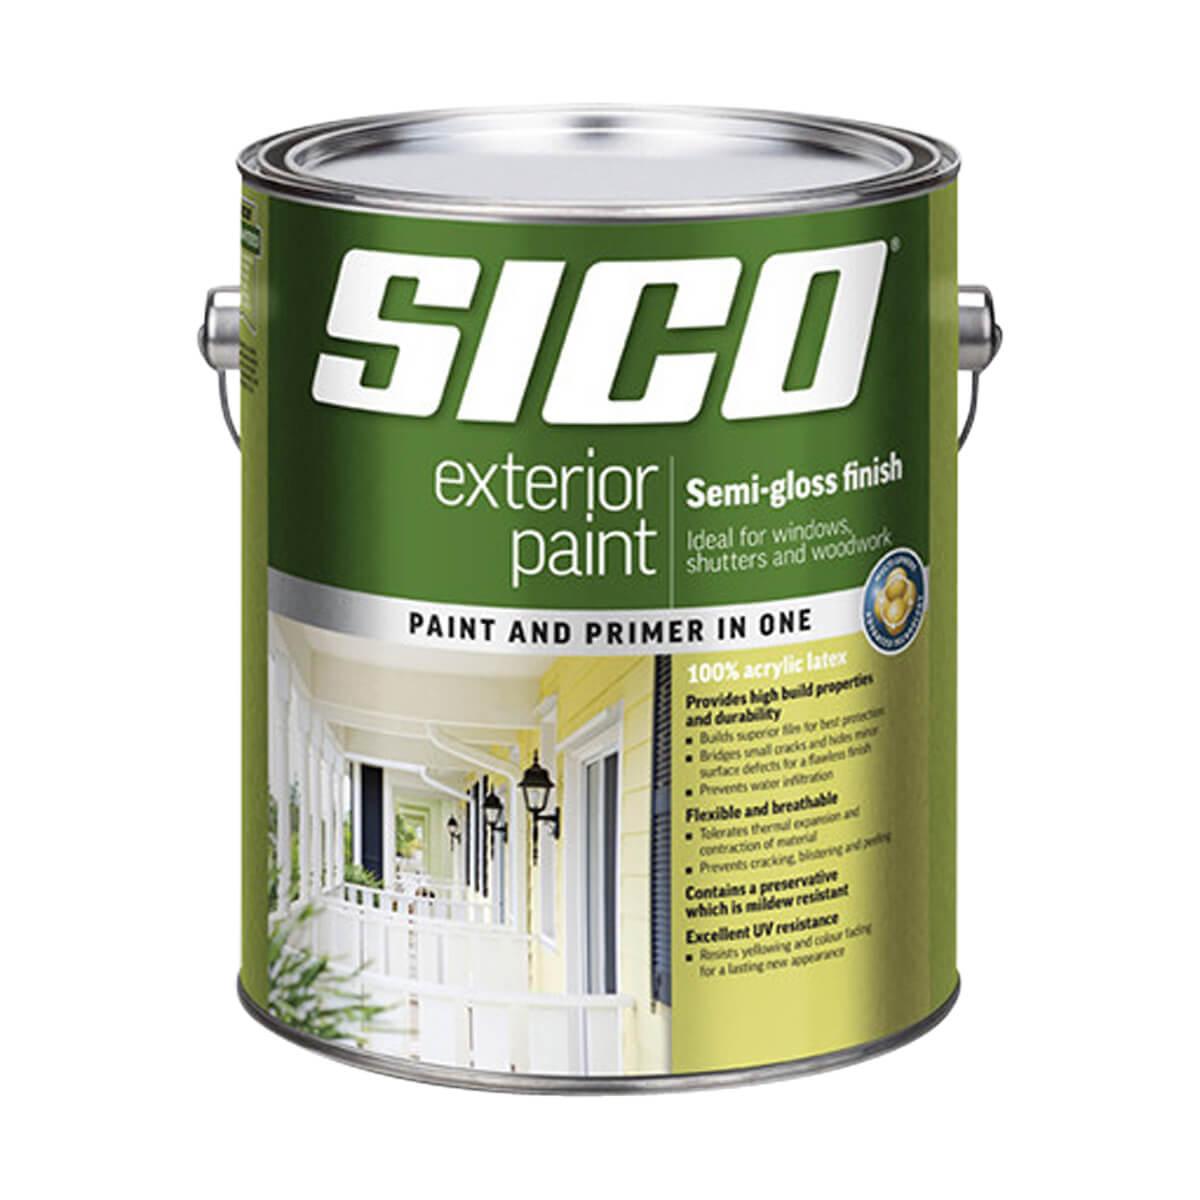 SICO Exterior Paint - Acylic - Semi-gloss Series 817 - Red Base - 3.78L